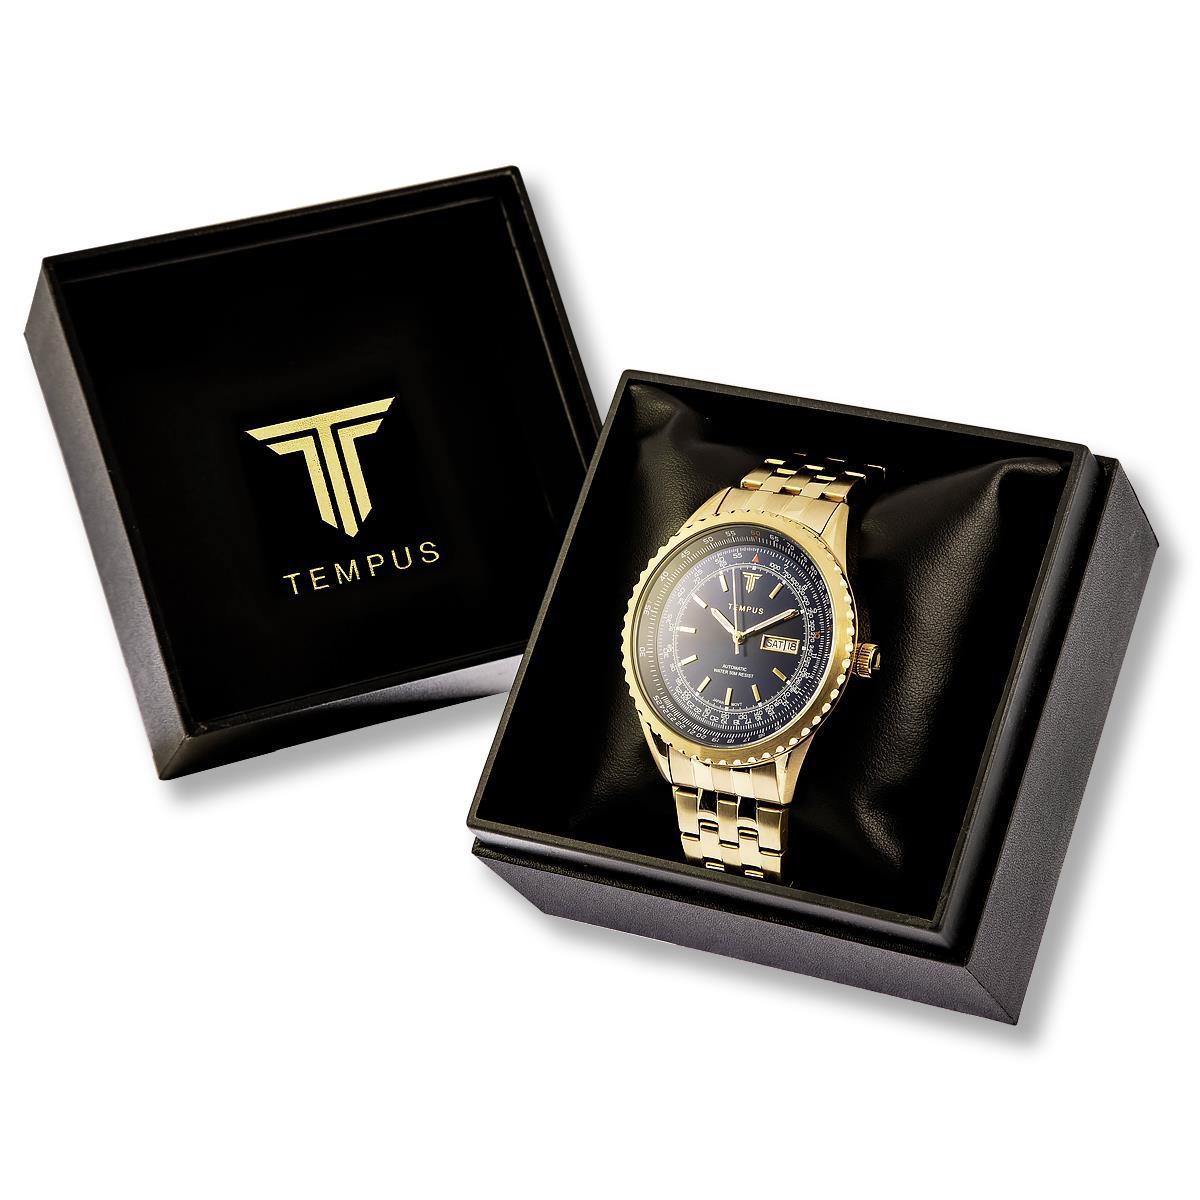 7038599161b 1073872 relogio-masculino-tempus-yacht-zw30321a-gold -blue z4 636759910080662200.jpg